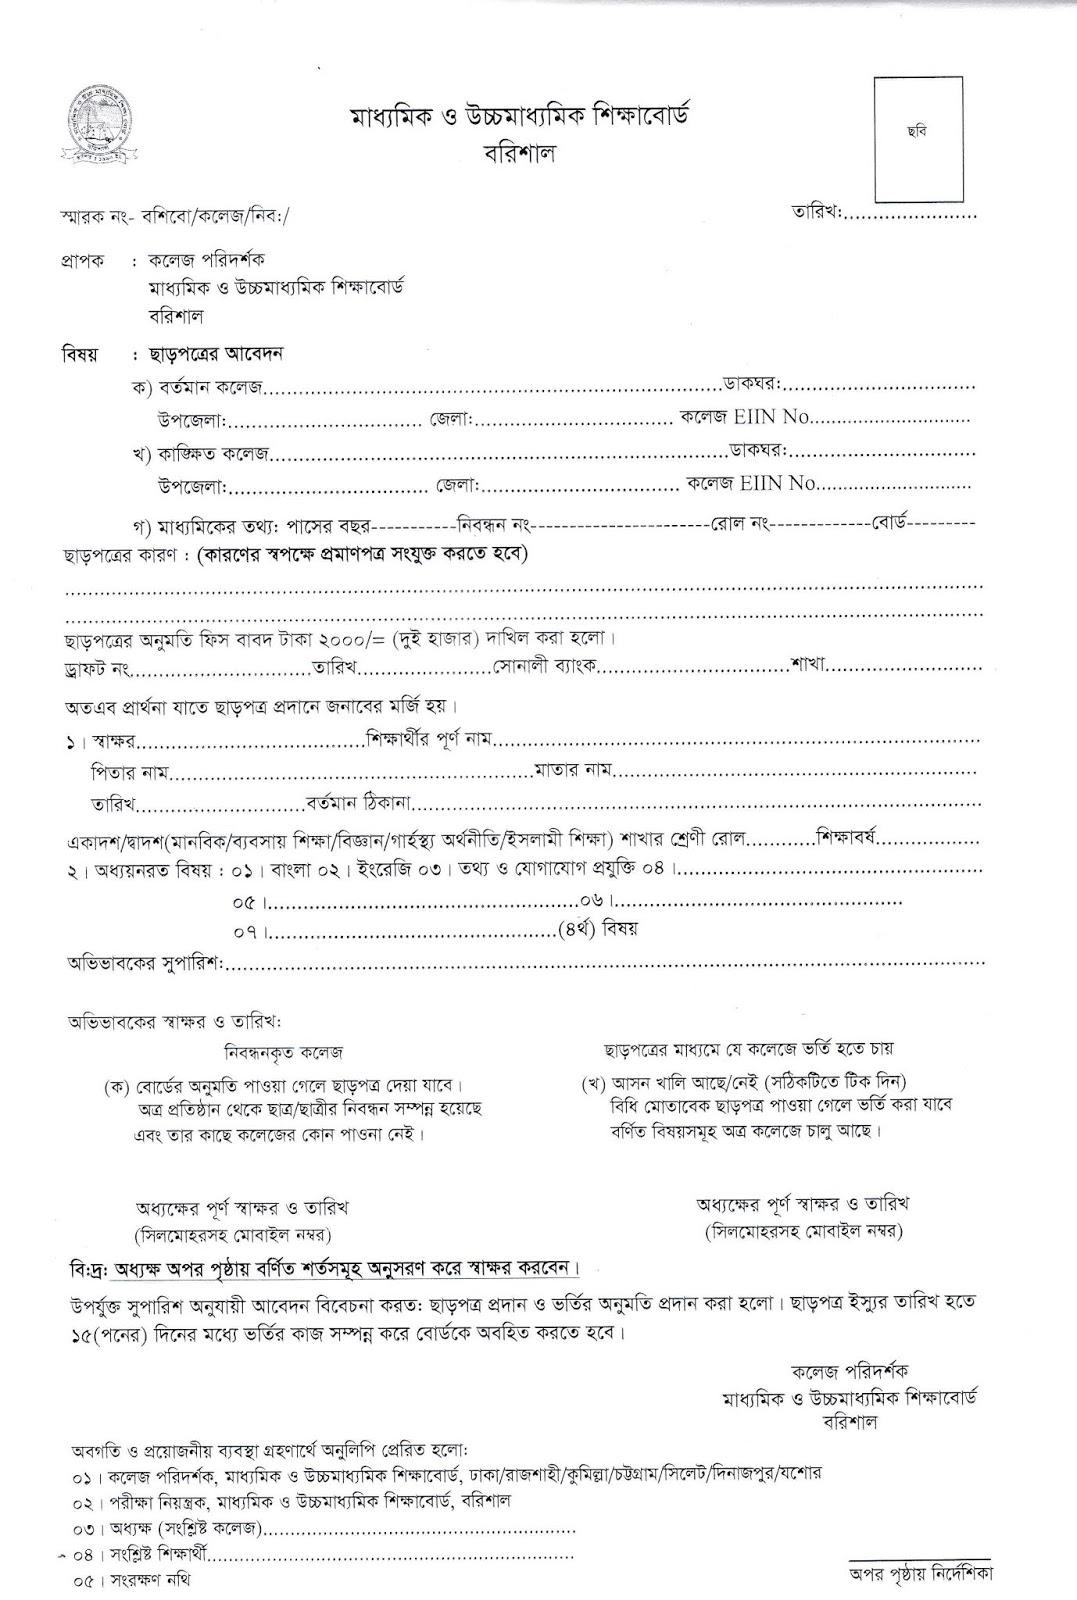 Barisal Board College Transfer Form  (TC FORM)   XI XII College Transfer Form